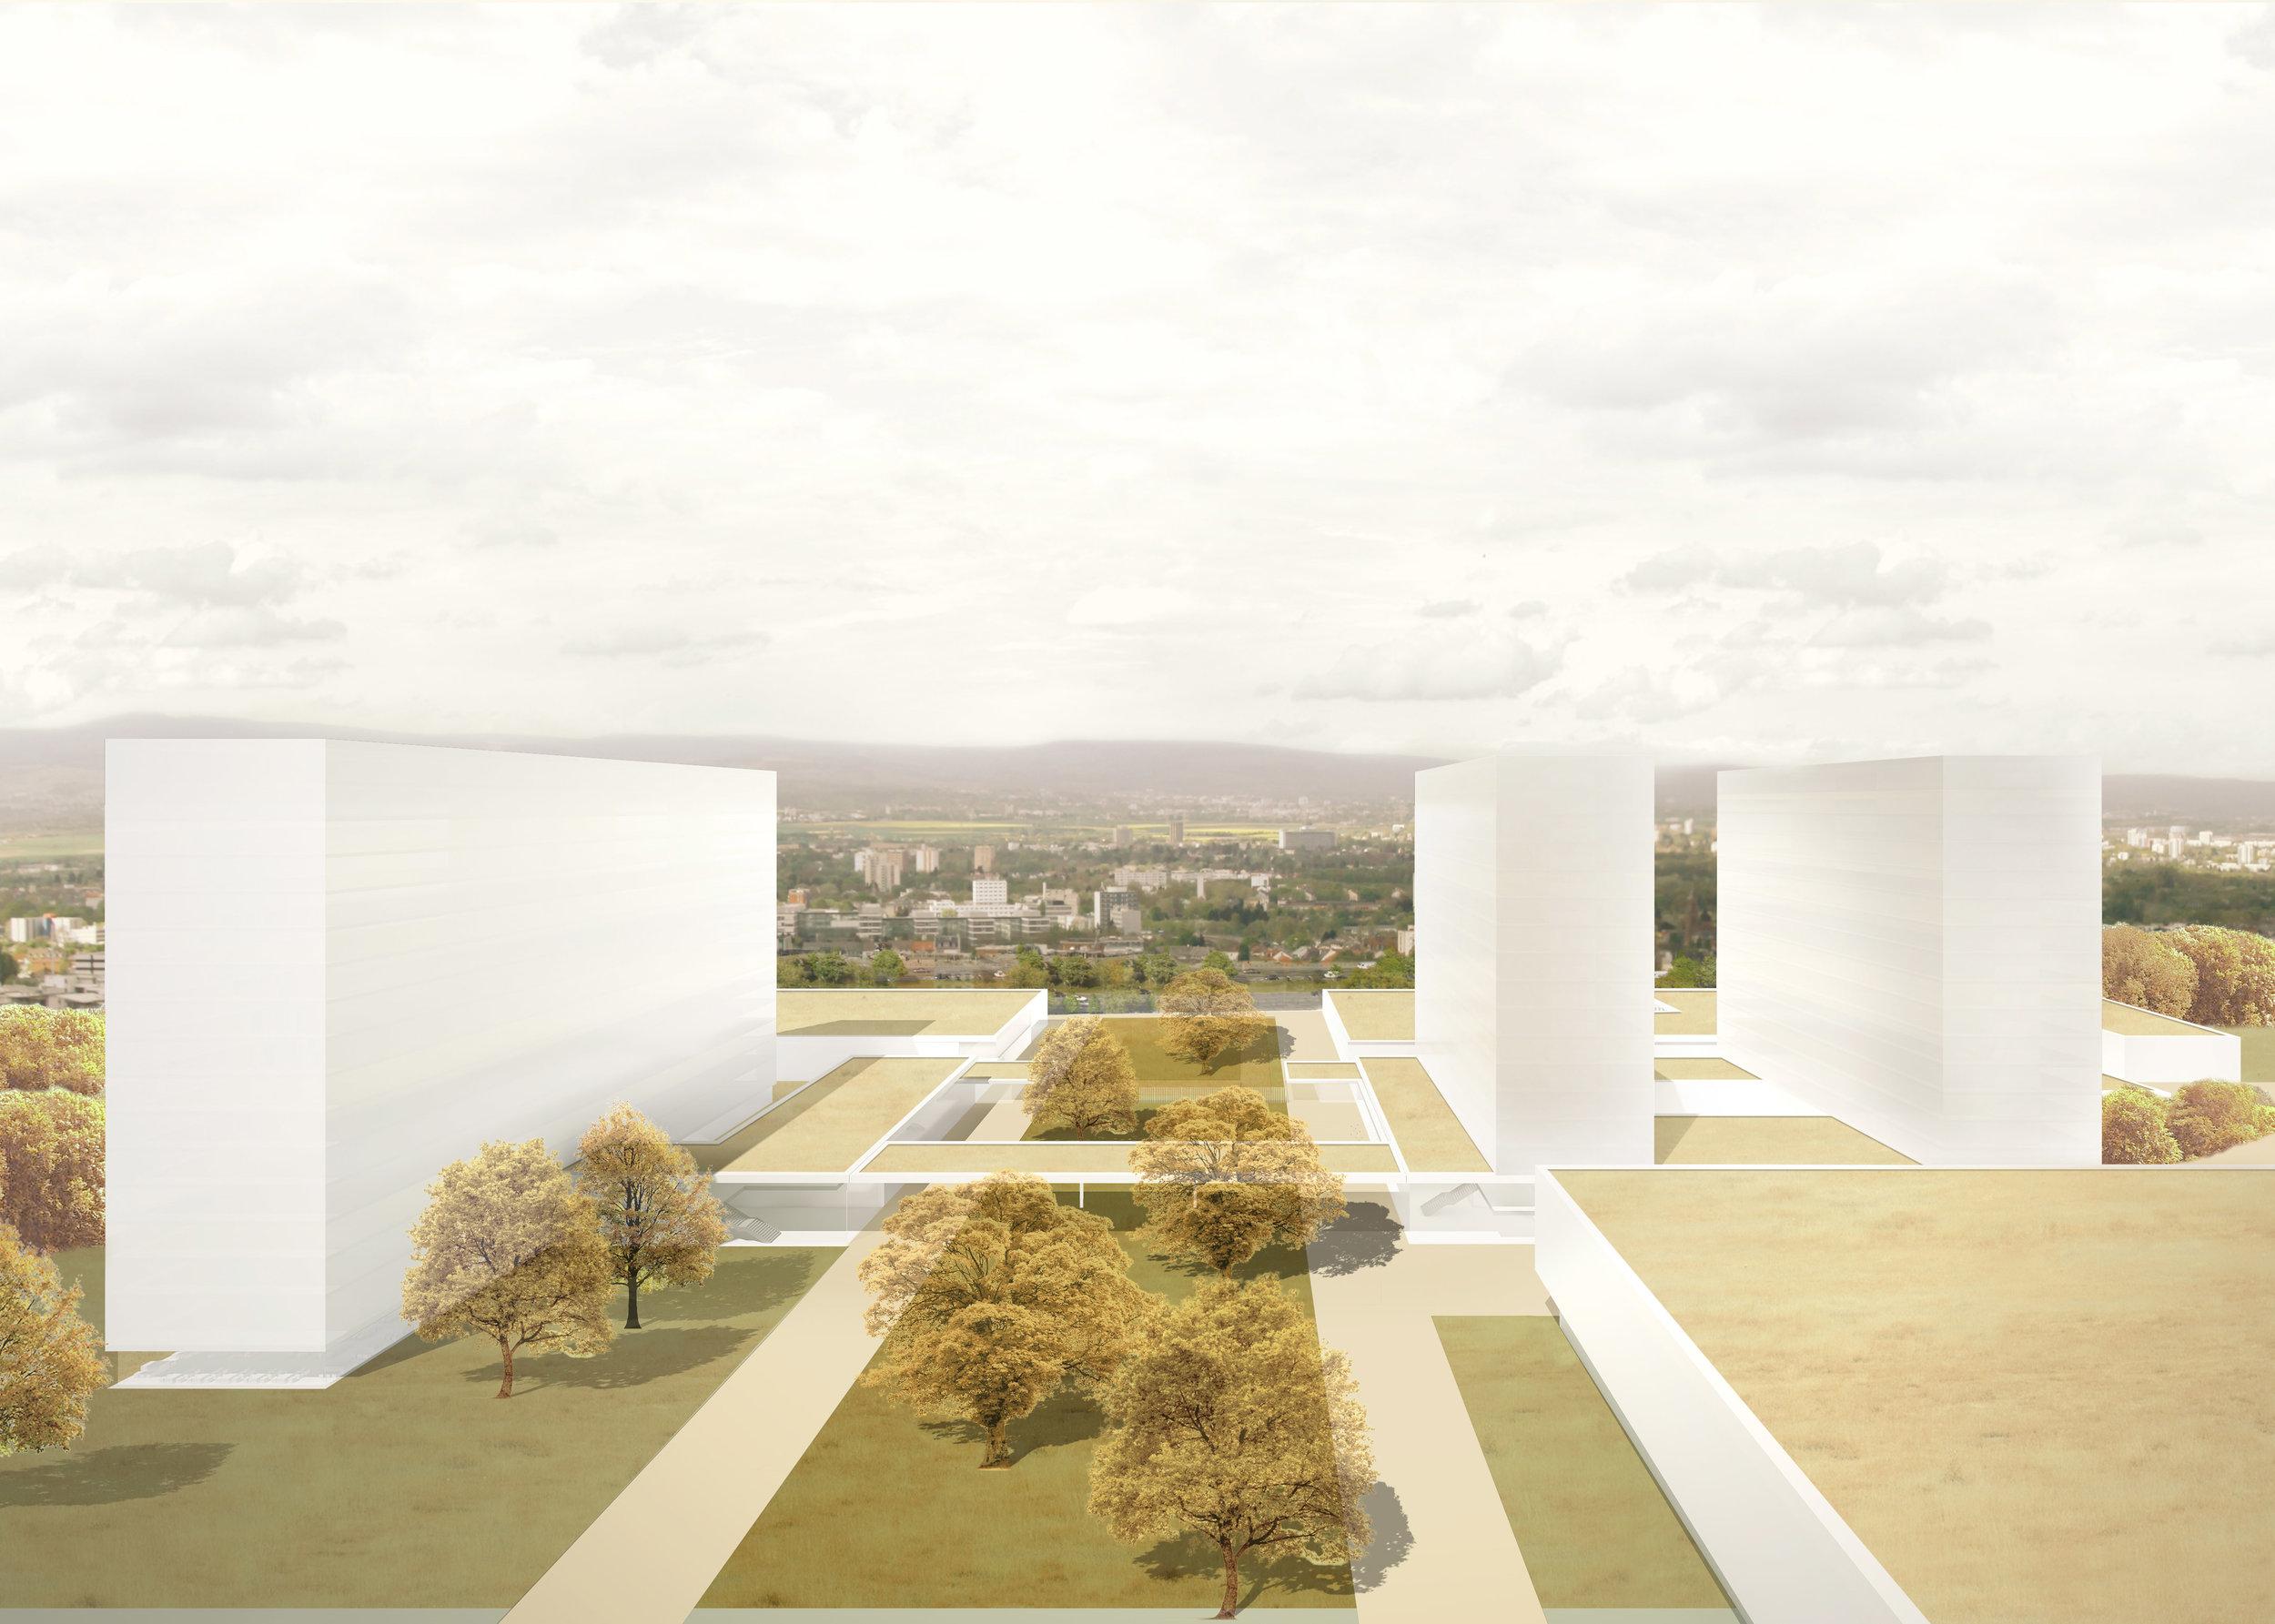 Perspektive_oben_Taunus2_web.jpg